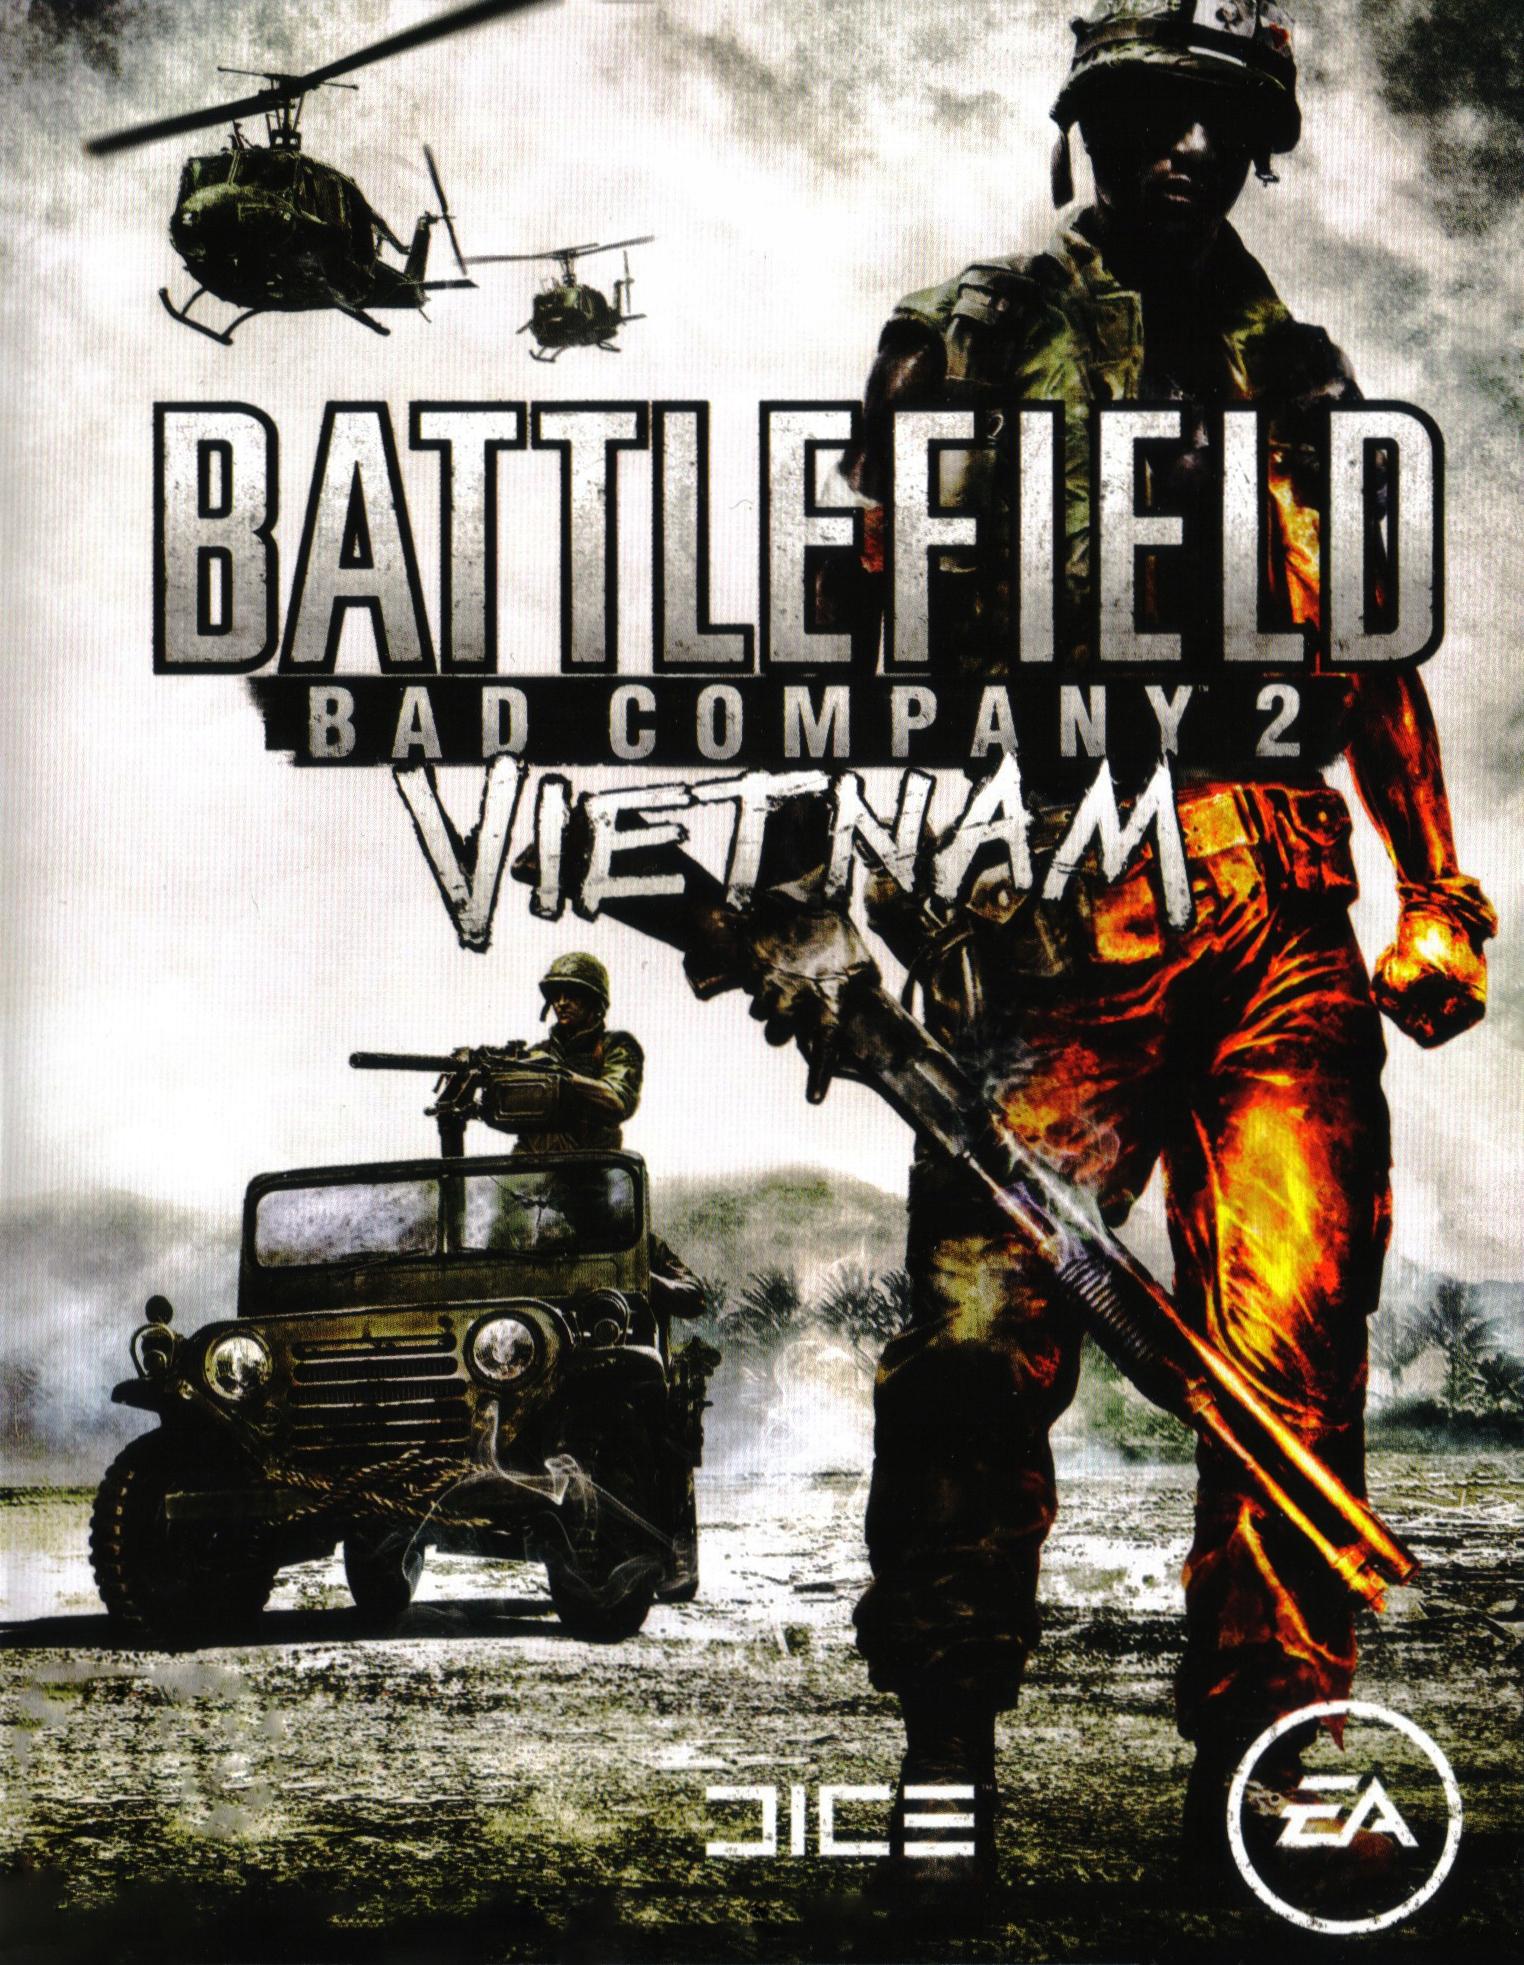 Battlefield Bad Company 2 Vietnam Dlc Klucz Stan Nowy 9537095607 Allegro Pl